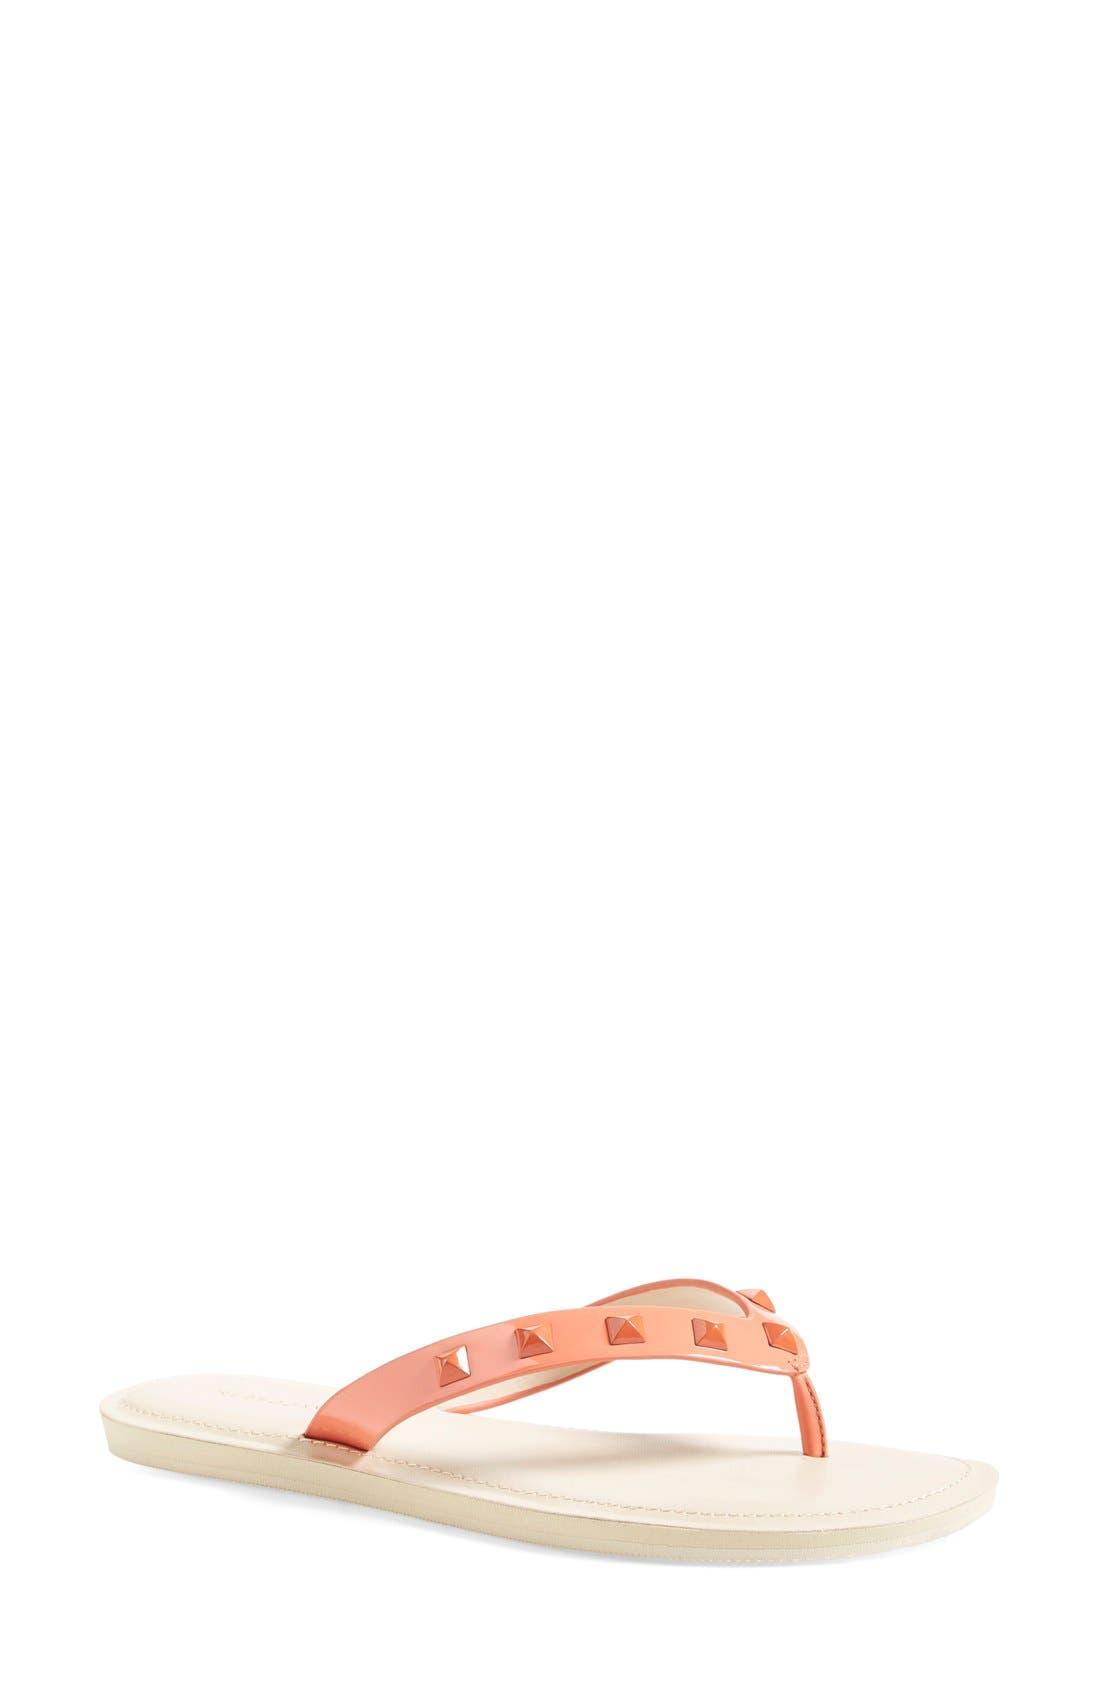 Main Image - Rebecca Minkoff 'Fiona' Thong Sandal (Women)